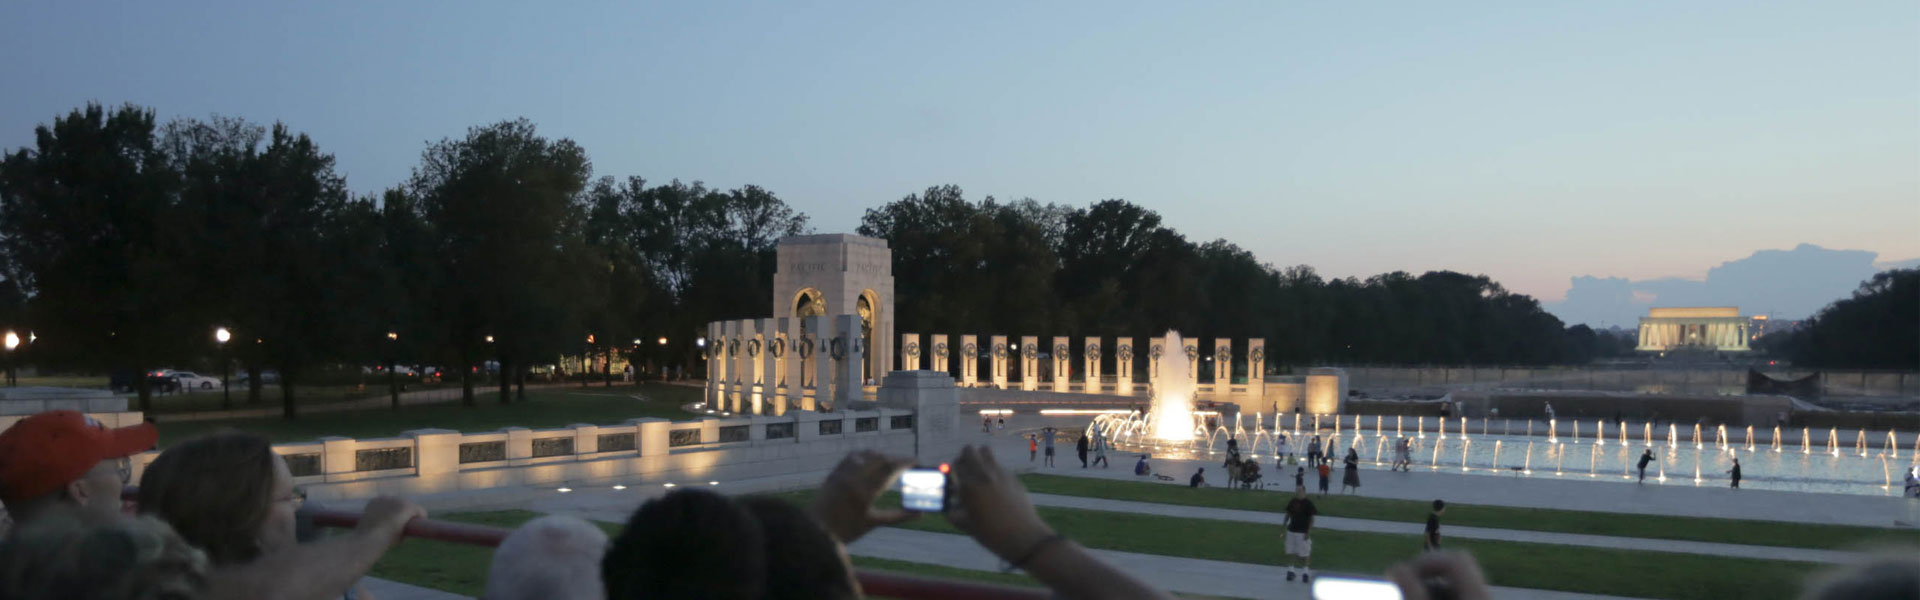 Arlington Memorial in Washington DC at dusk